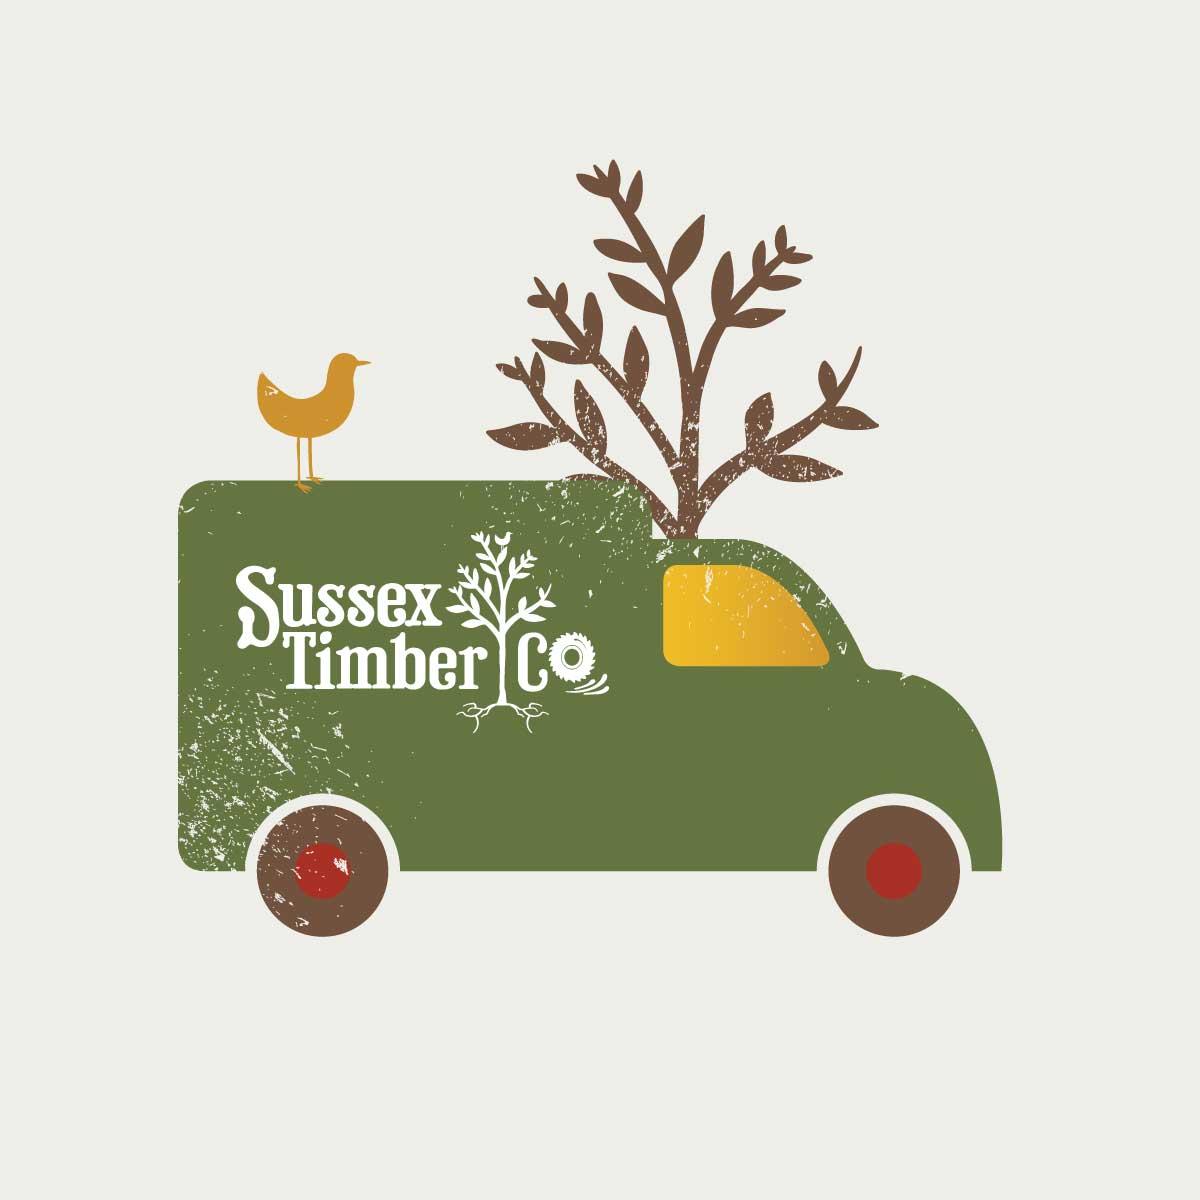 Sussex-Timber-Co-Van-Illustration